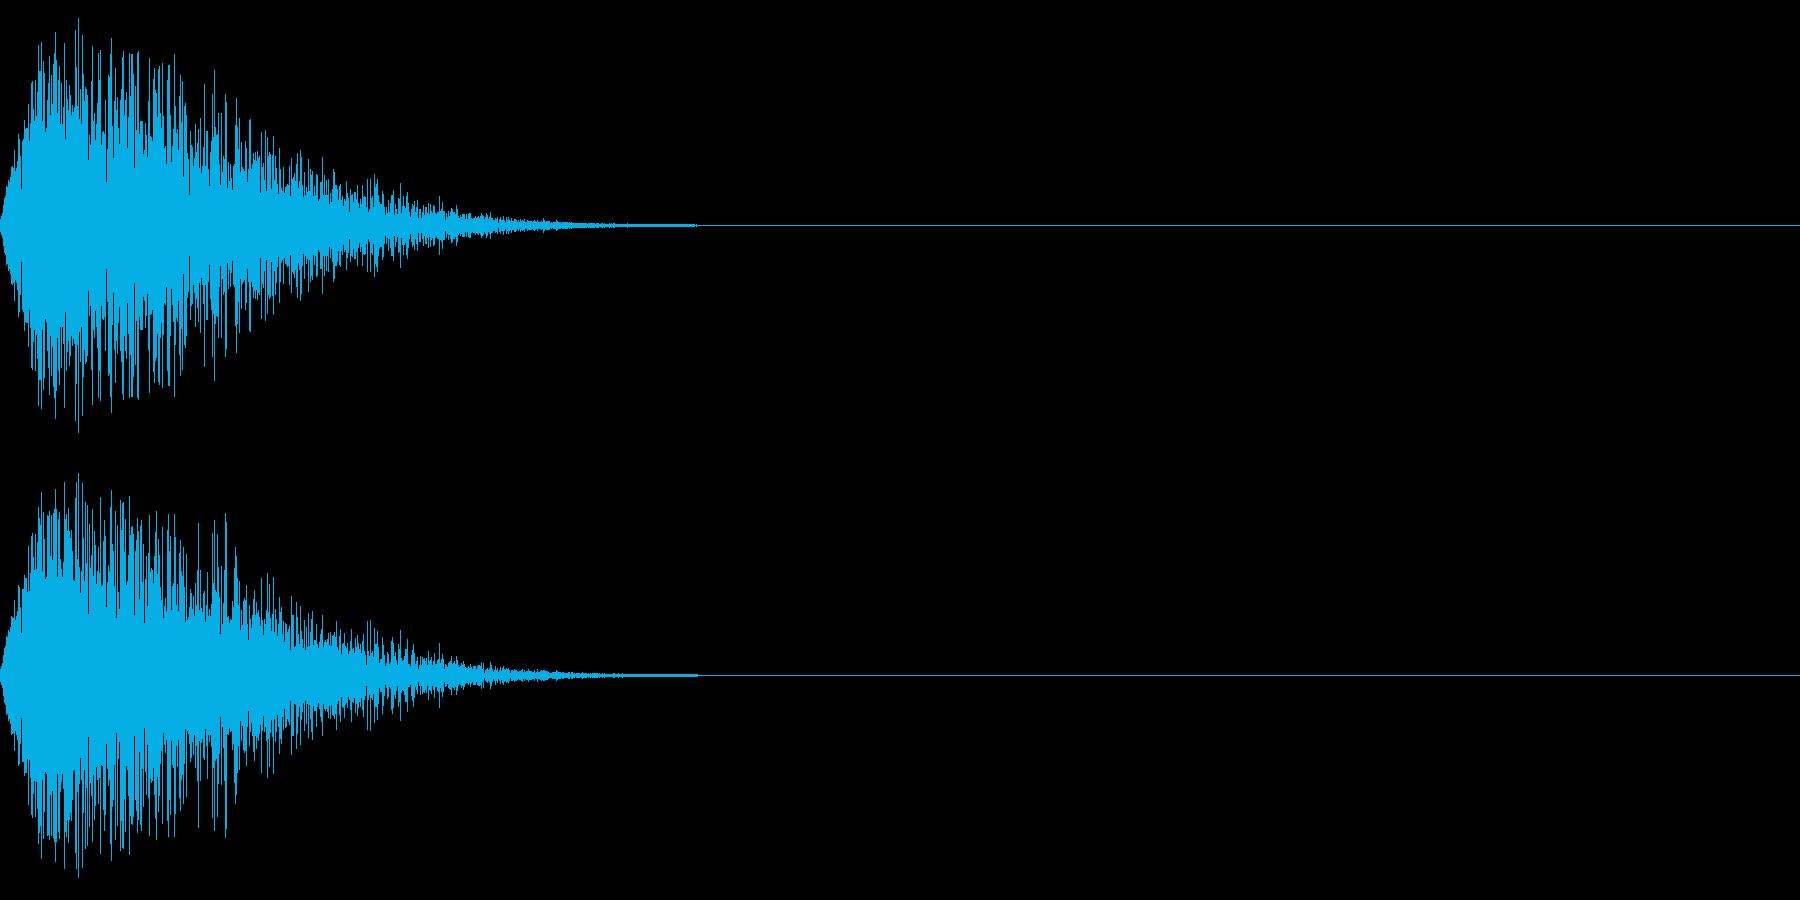 DTM Snare 14 オリジナル音源の再生済みの波形